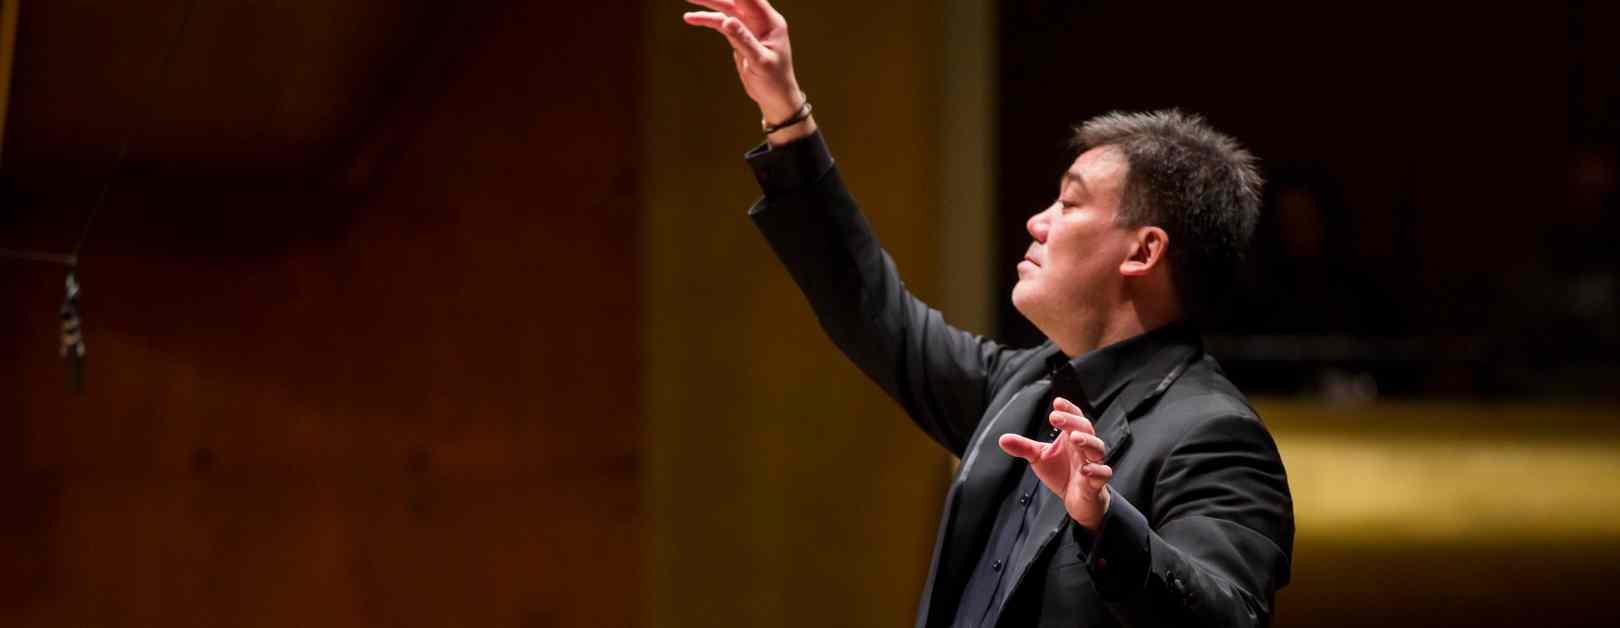 Gilbert Conducts Wagner's Das Rheingold